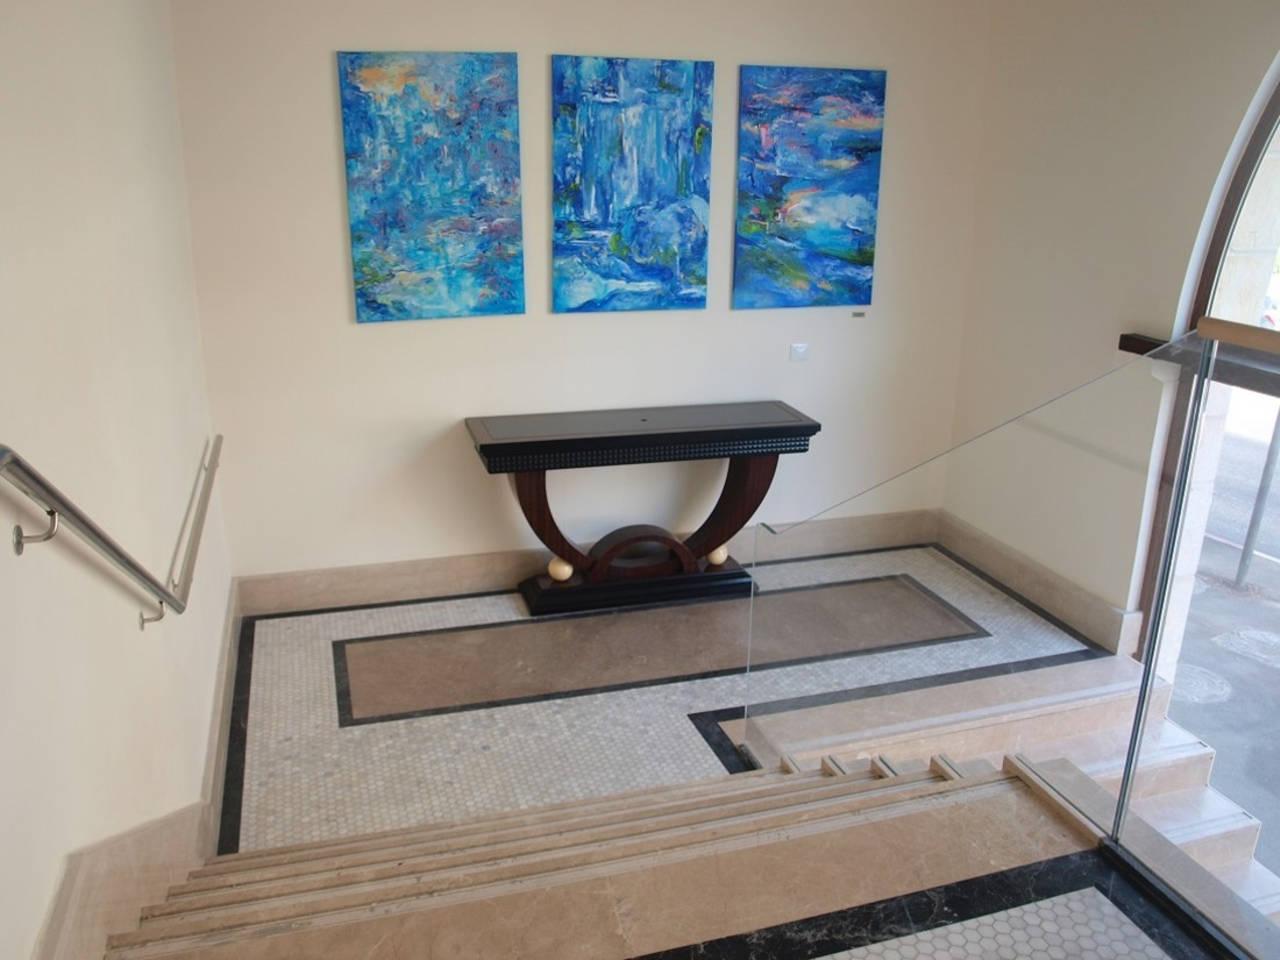 Apartment Great Location - Mamilla Mall Super Luxurious Flat photo 16817605